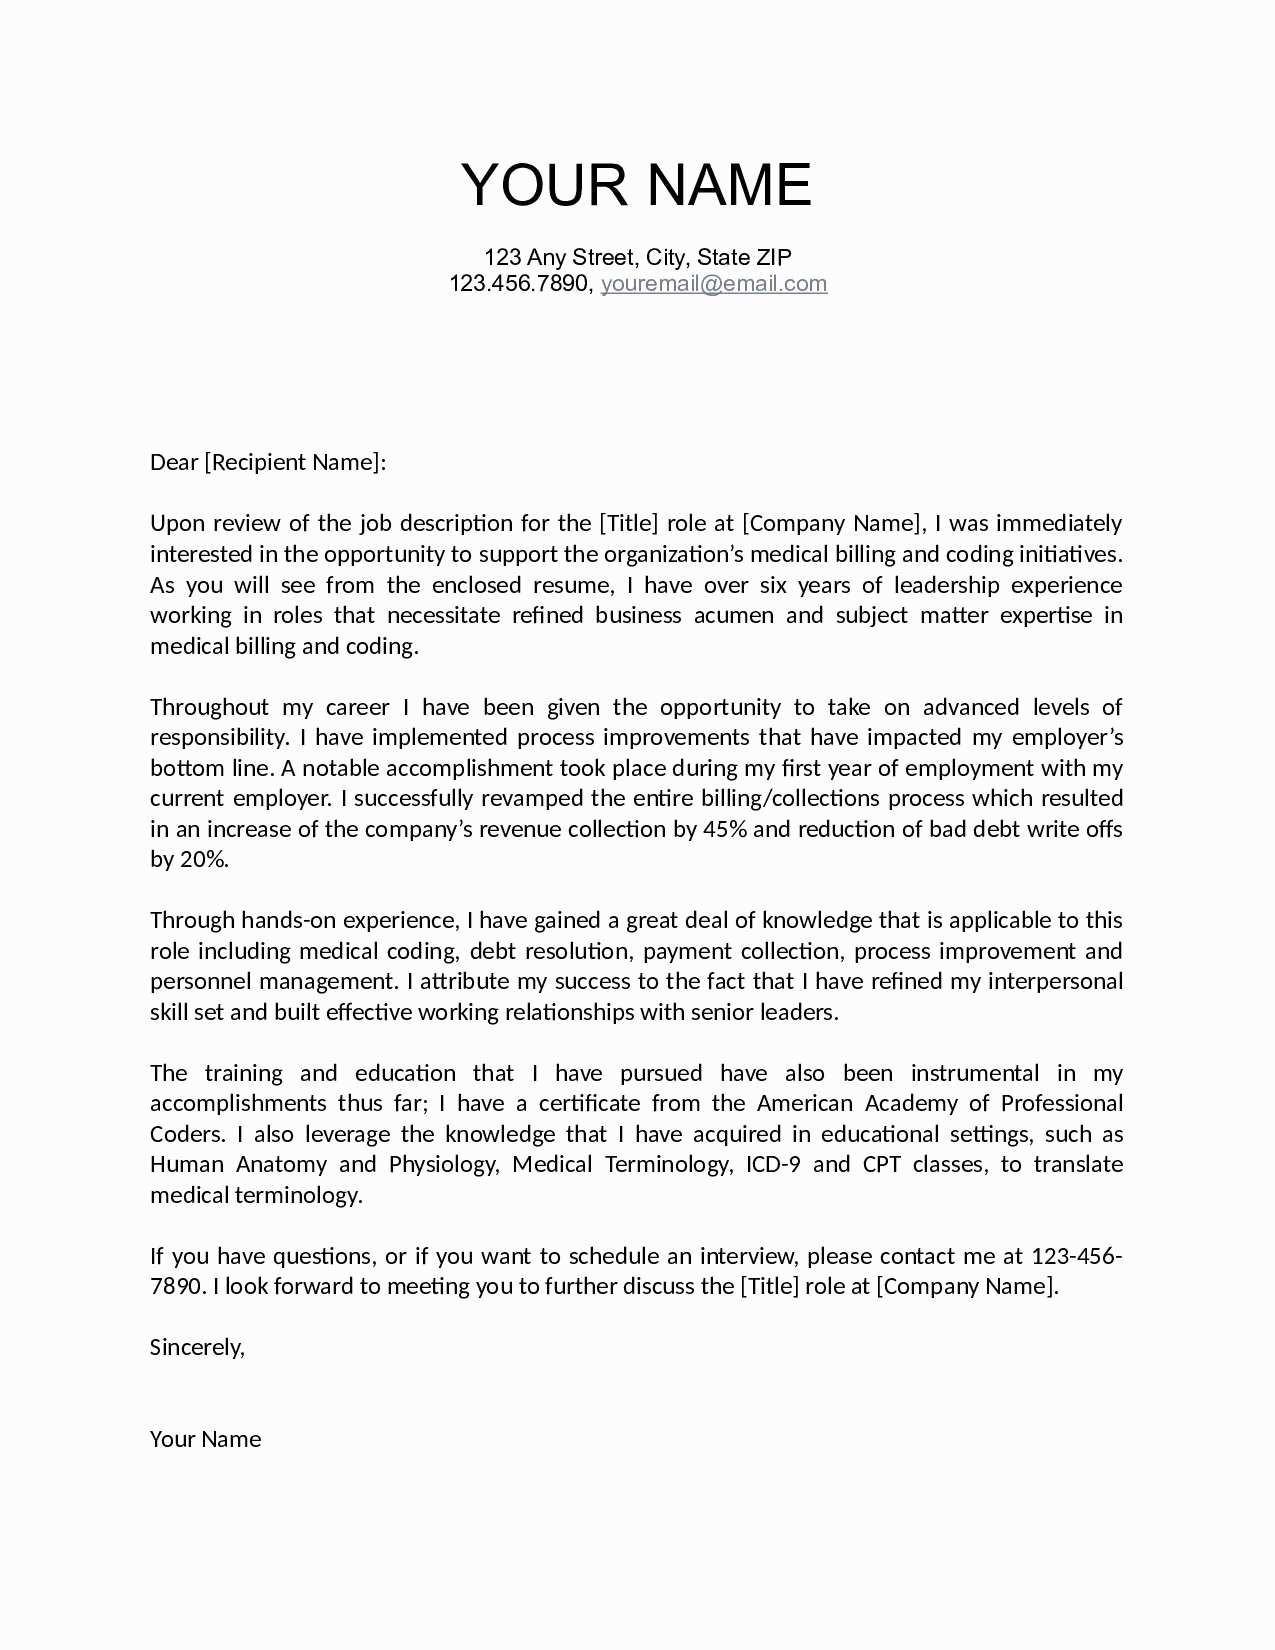 Cover Letter Template for Management Position - Sample Cover Letter for Senior Manager Position Save Job Fer Letter